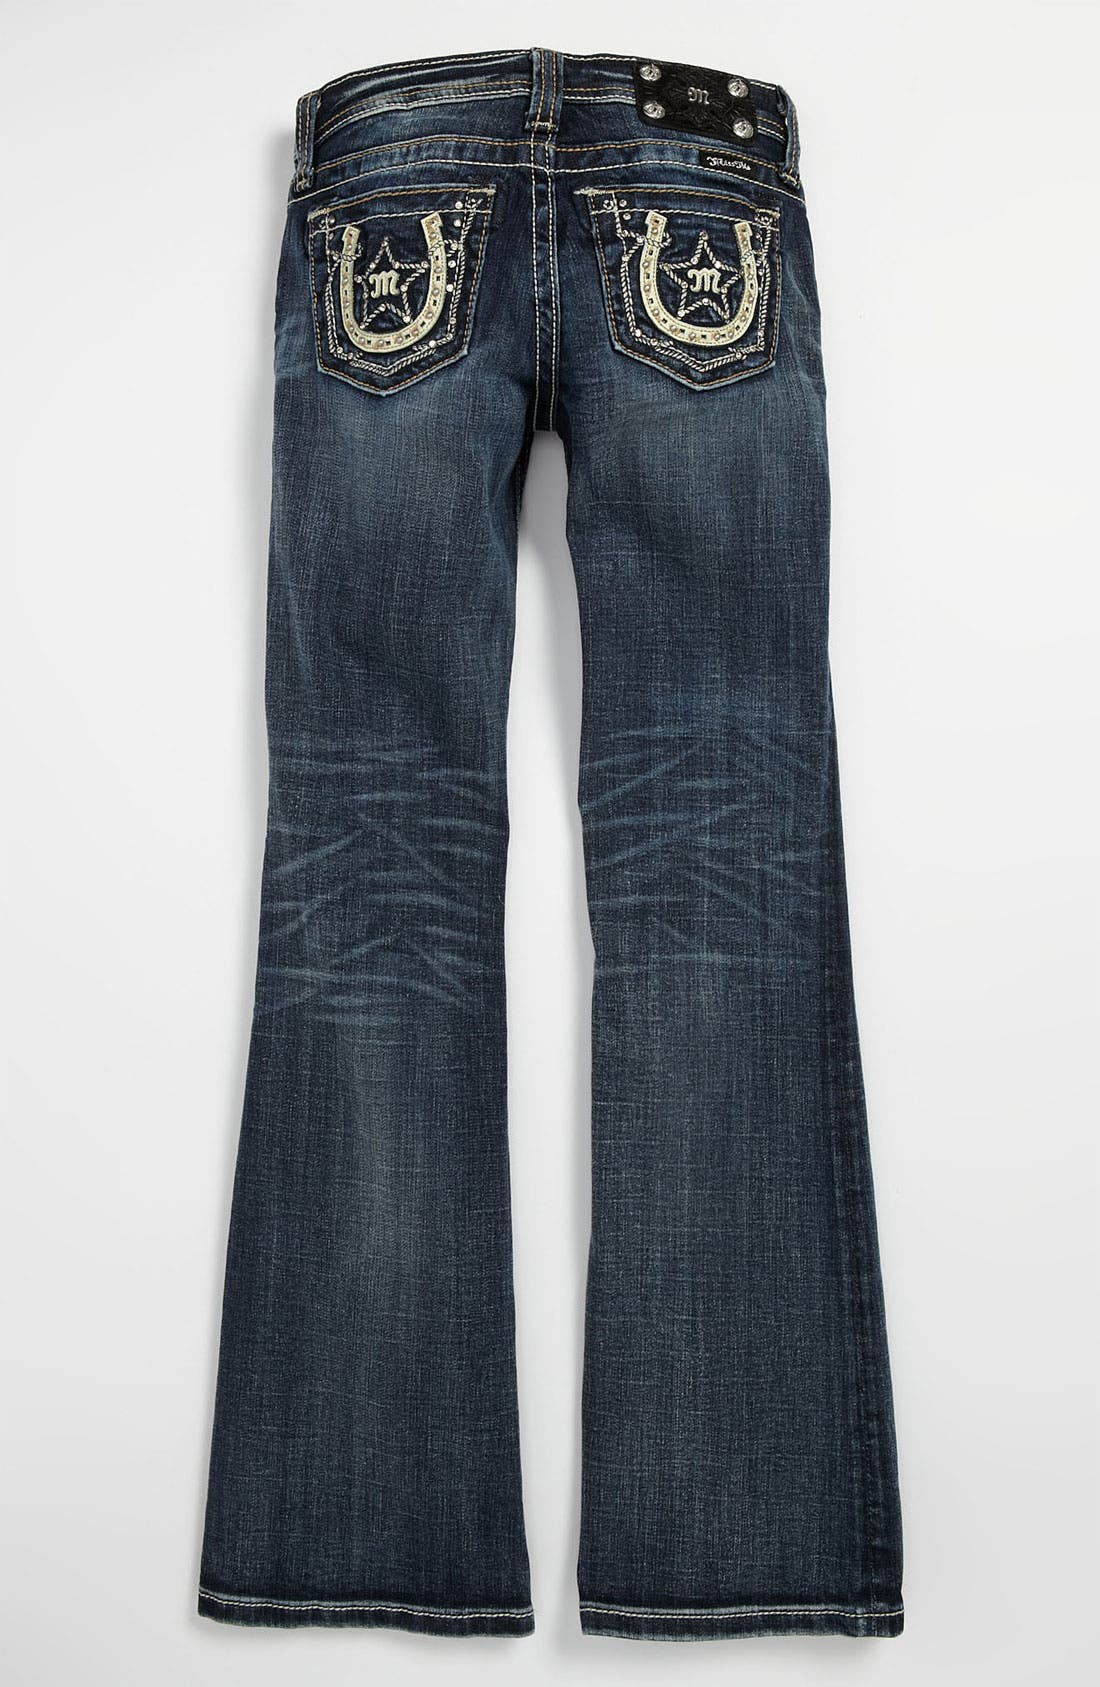 Main Image - Miss Me 'Horseshoe' Bootcut Jeans (Big Girls)